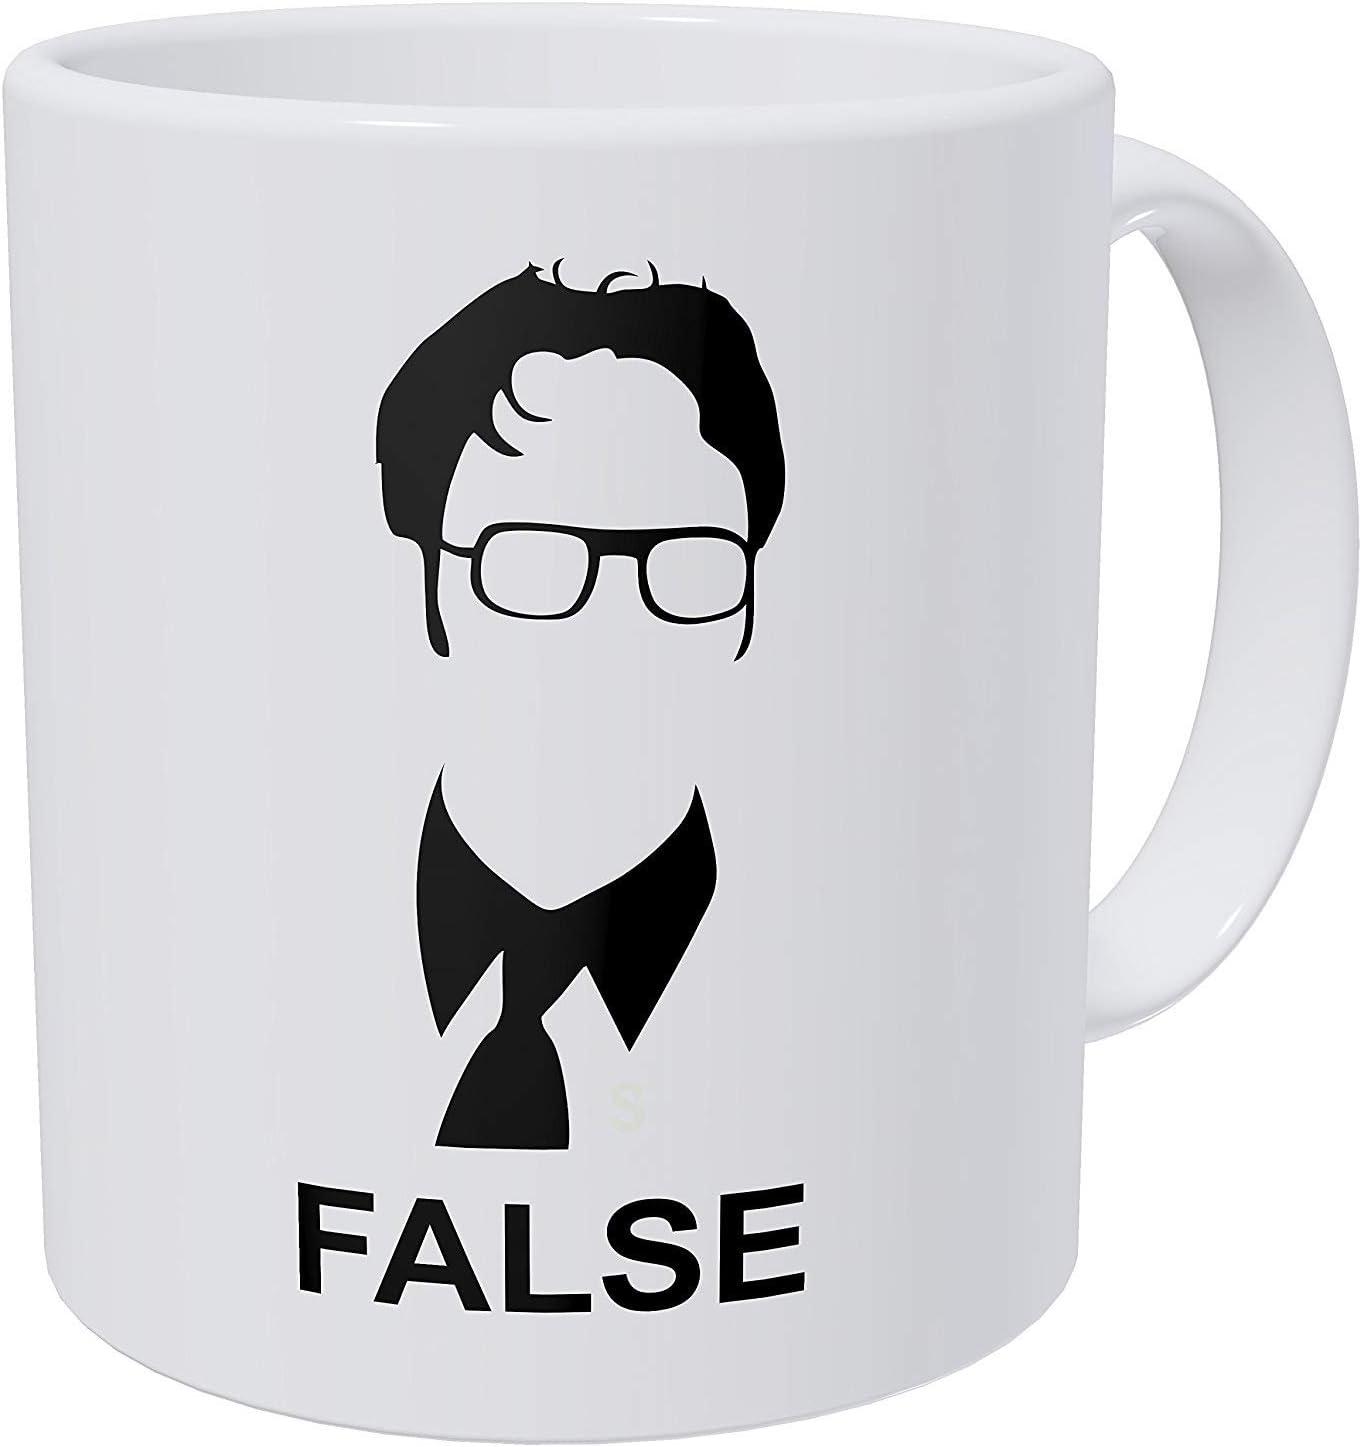 Wampumtuk False Jim Halpert The Office - 11 Ounces Funny Coffee Mug